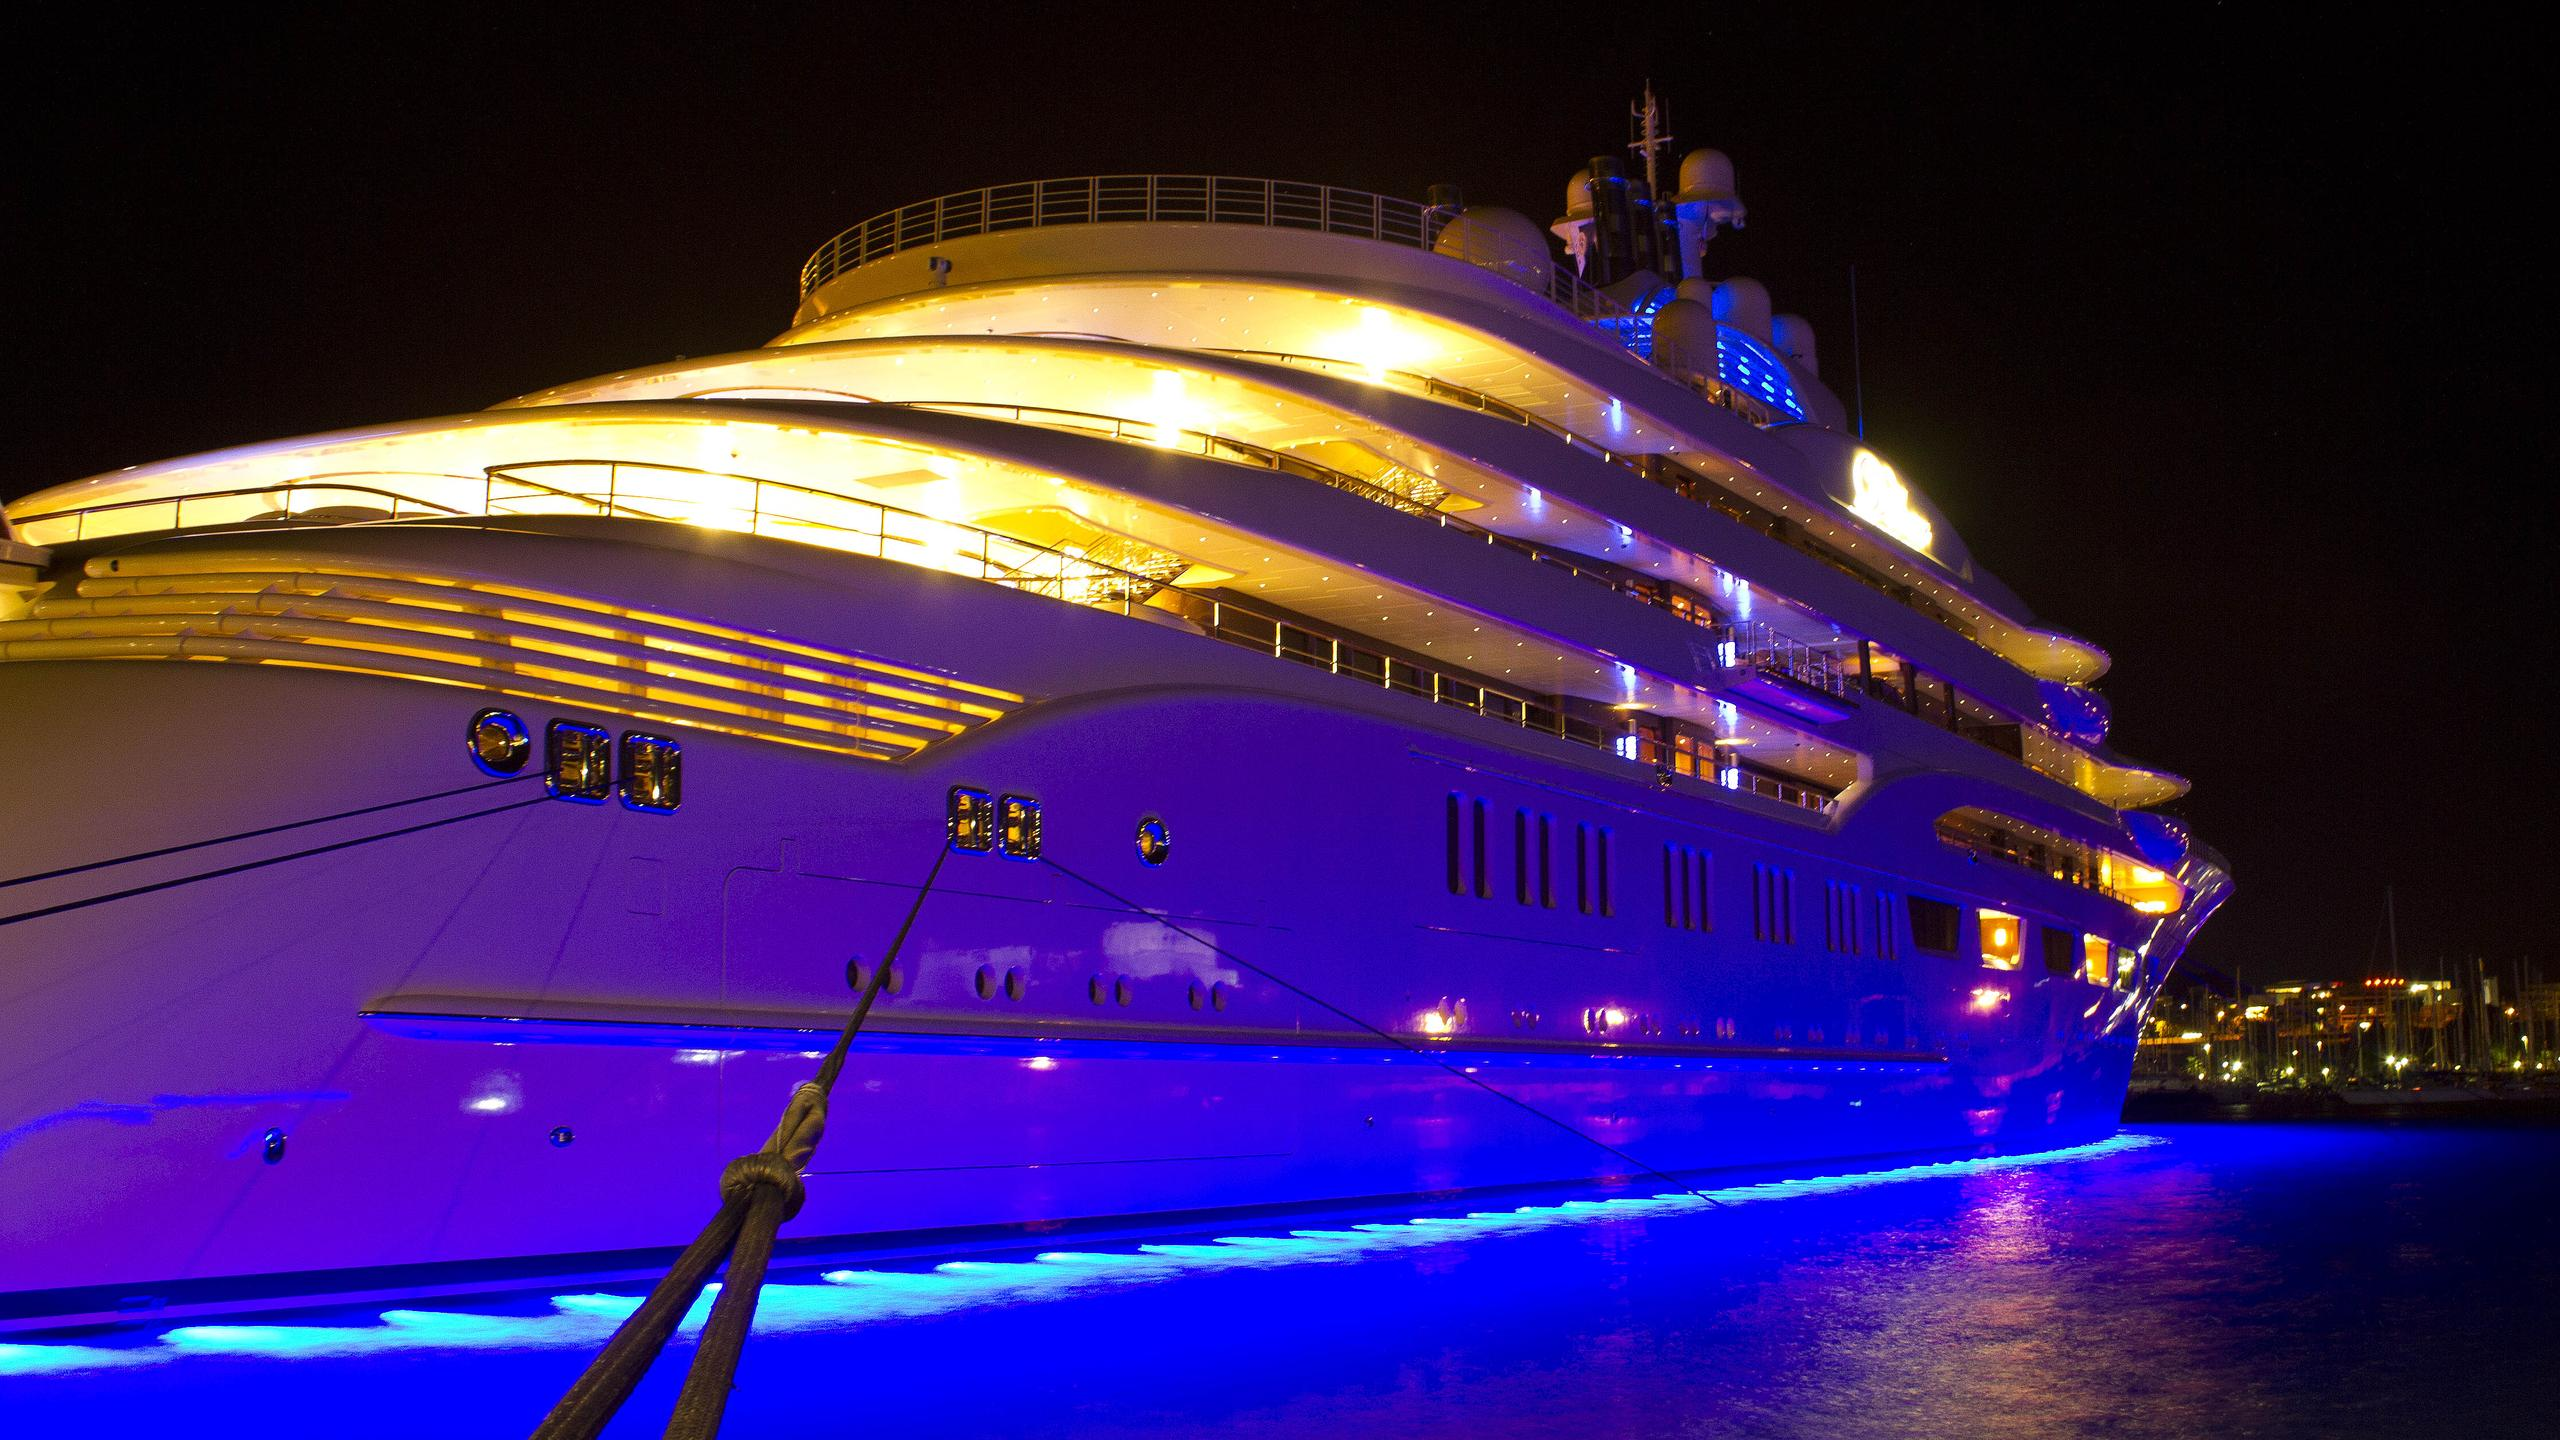 dilbar-motor-yacht-lurssen-2016-156m-part-stern-by-night